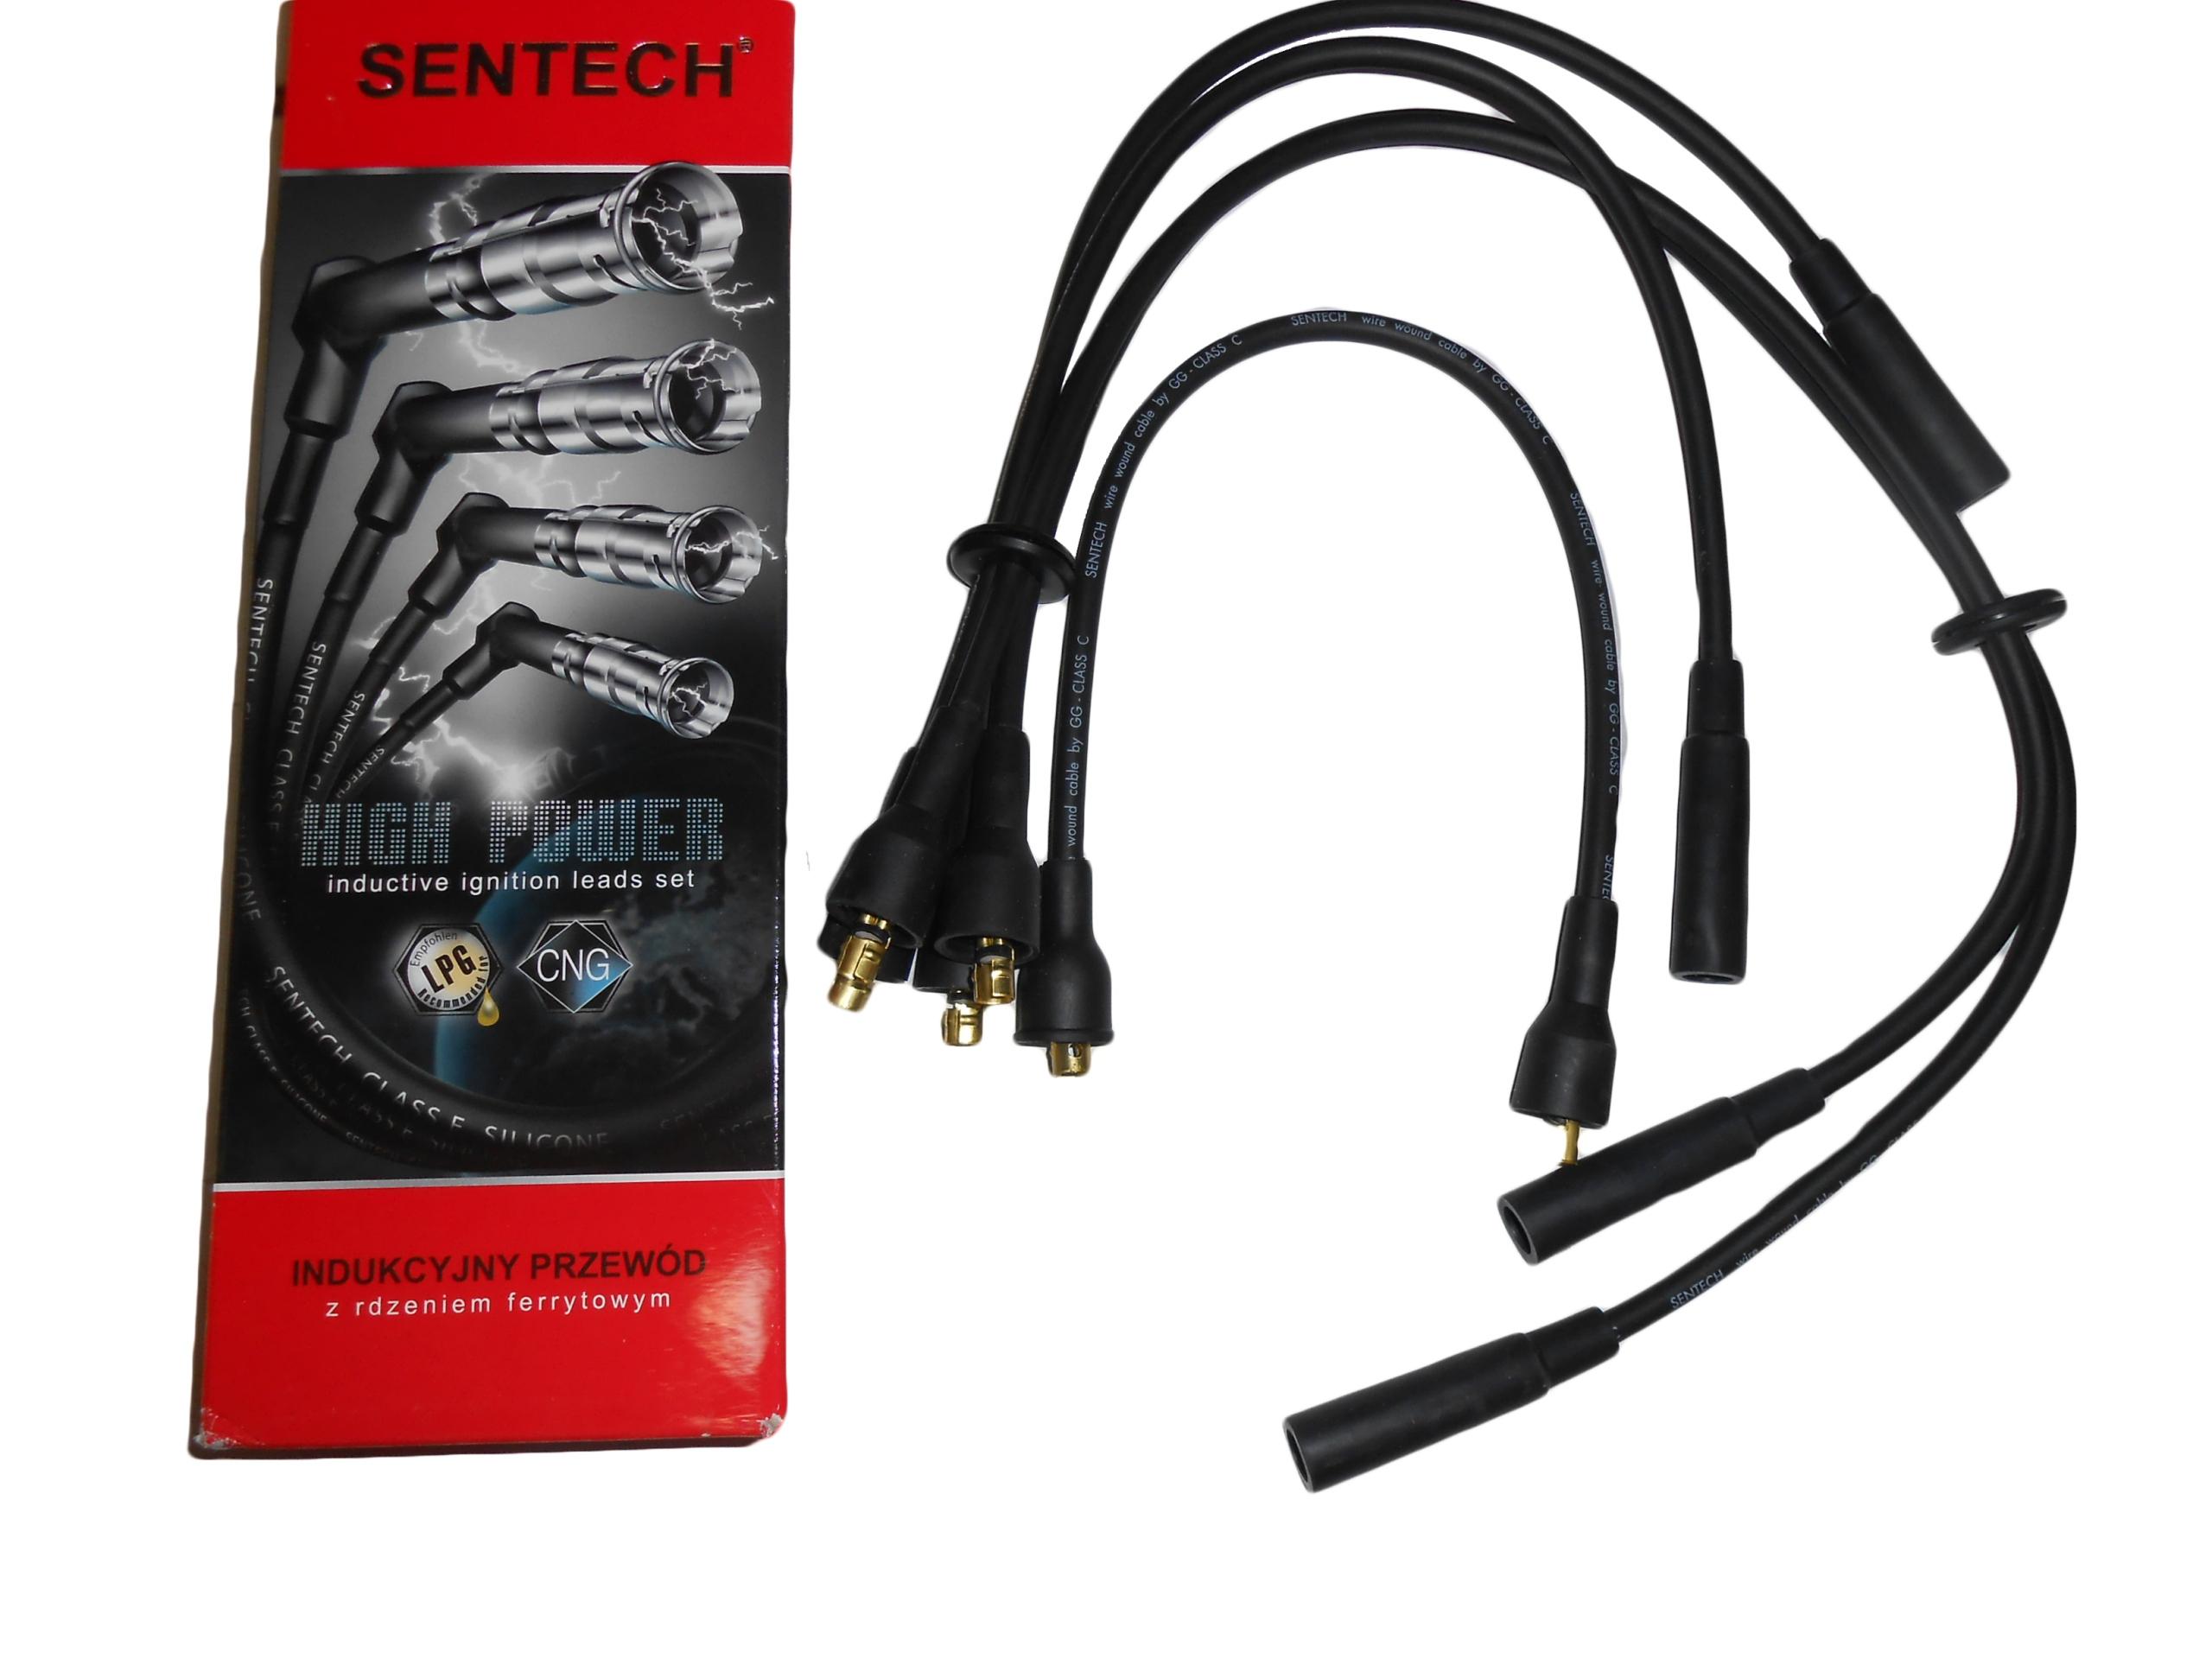 провода кабели зажигания fiat 125p полонез fso ory